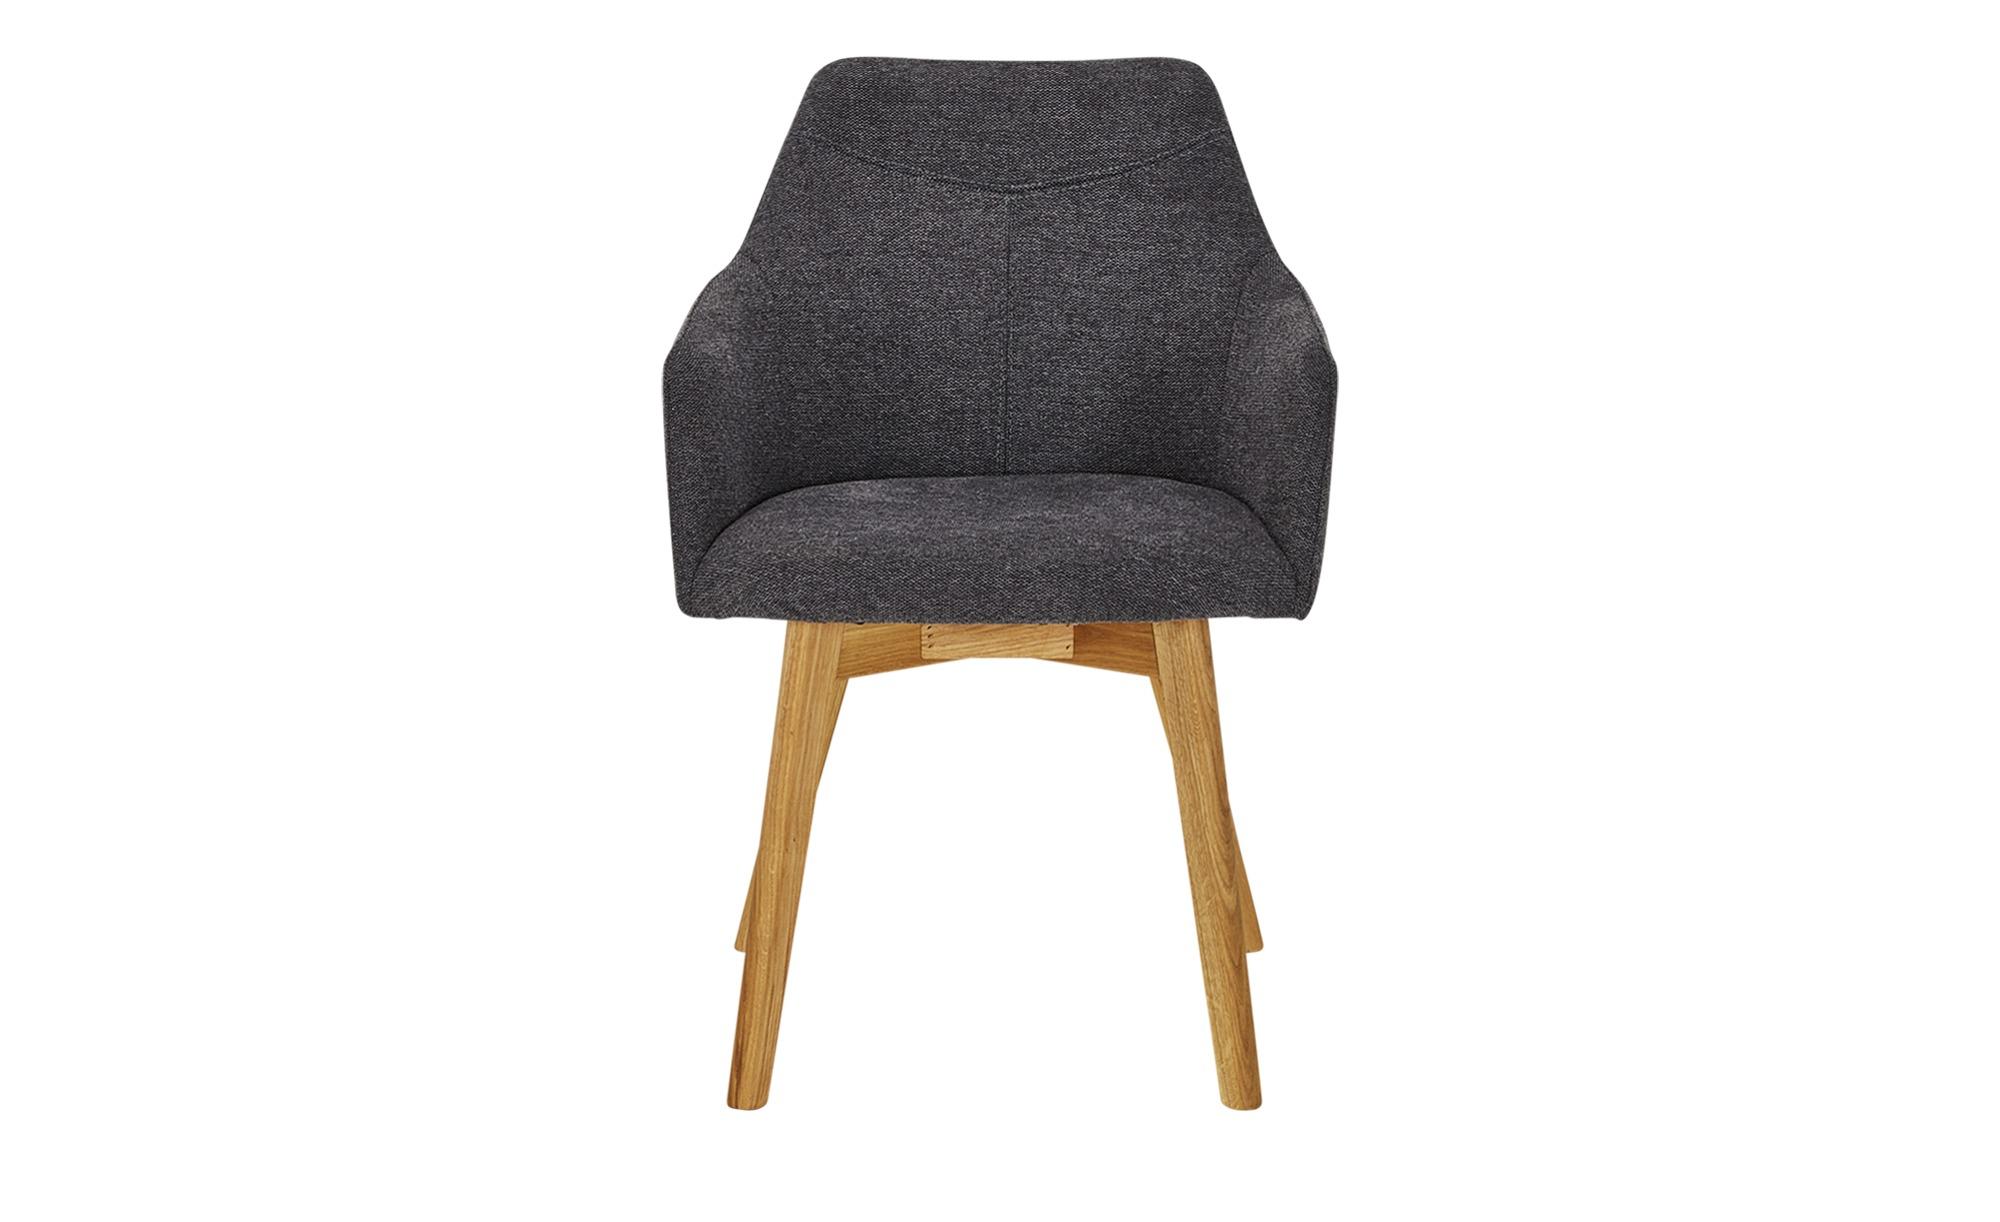 Woodford Sessel  Muron ¦ grau ¦ Maße (cm): B: 57 H: 84 T: 57 Stühle > Esszimmerstühle > Esszimmerstühle mit Armlehnen - Höffner